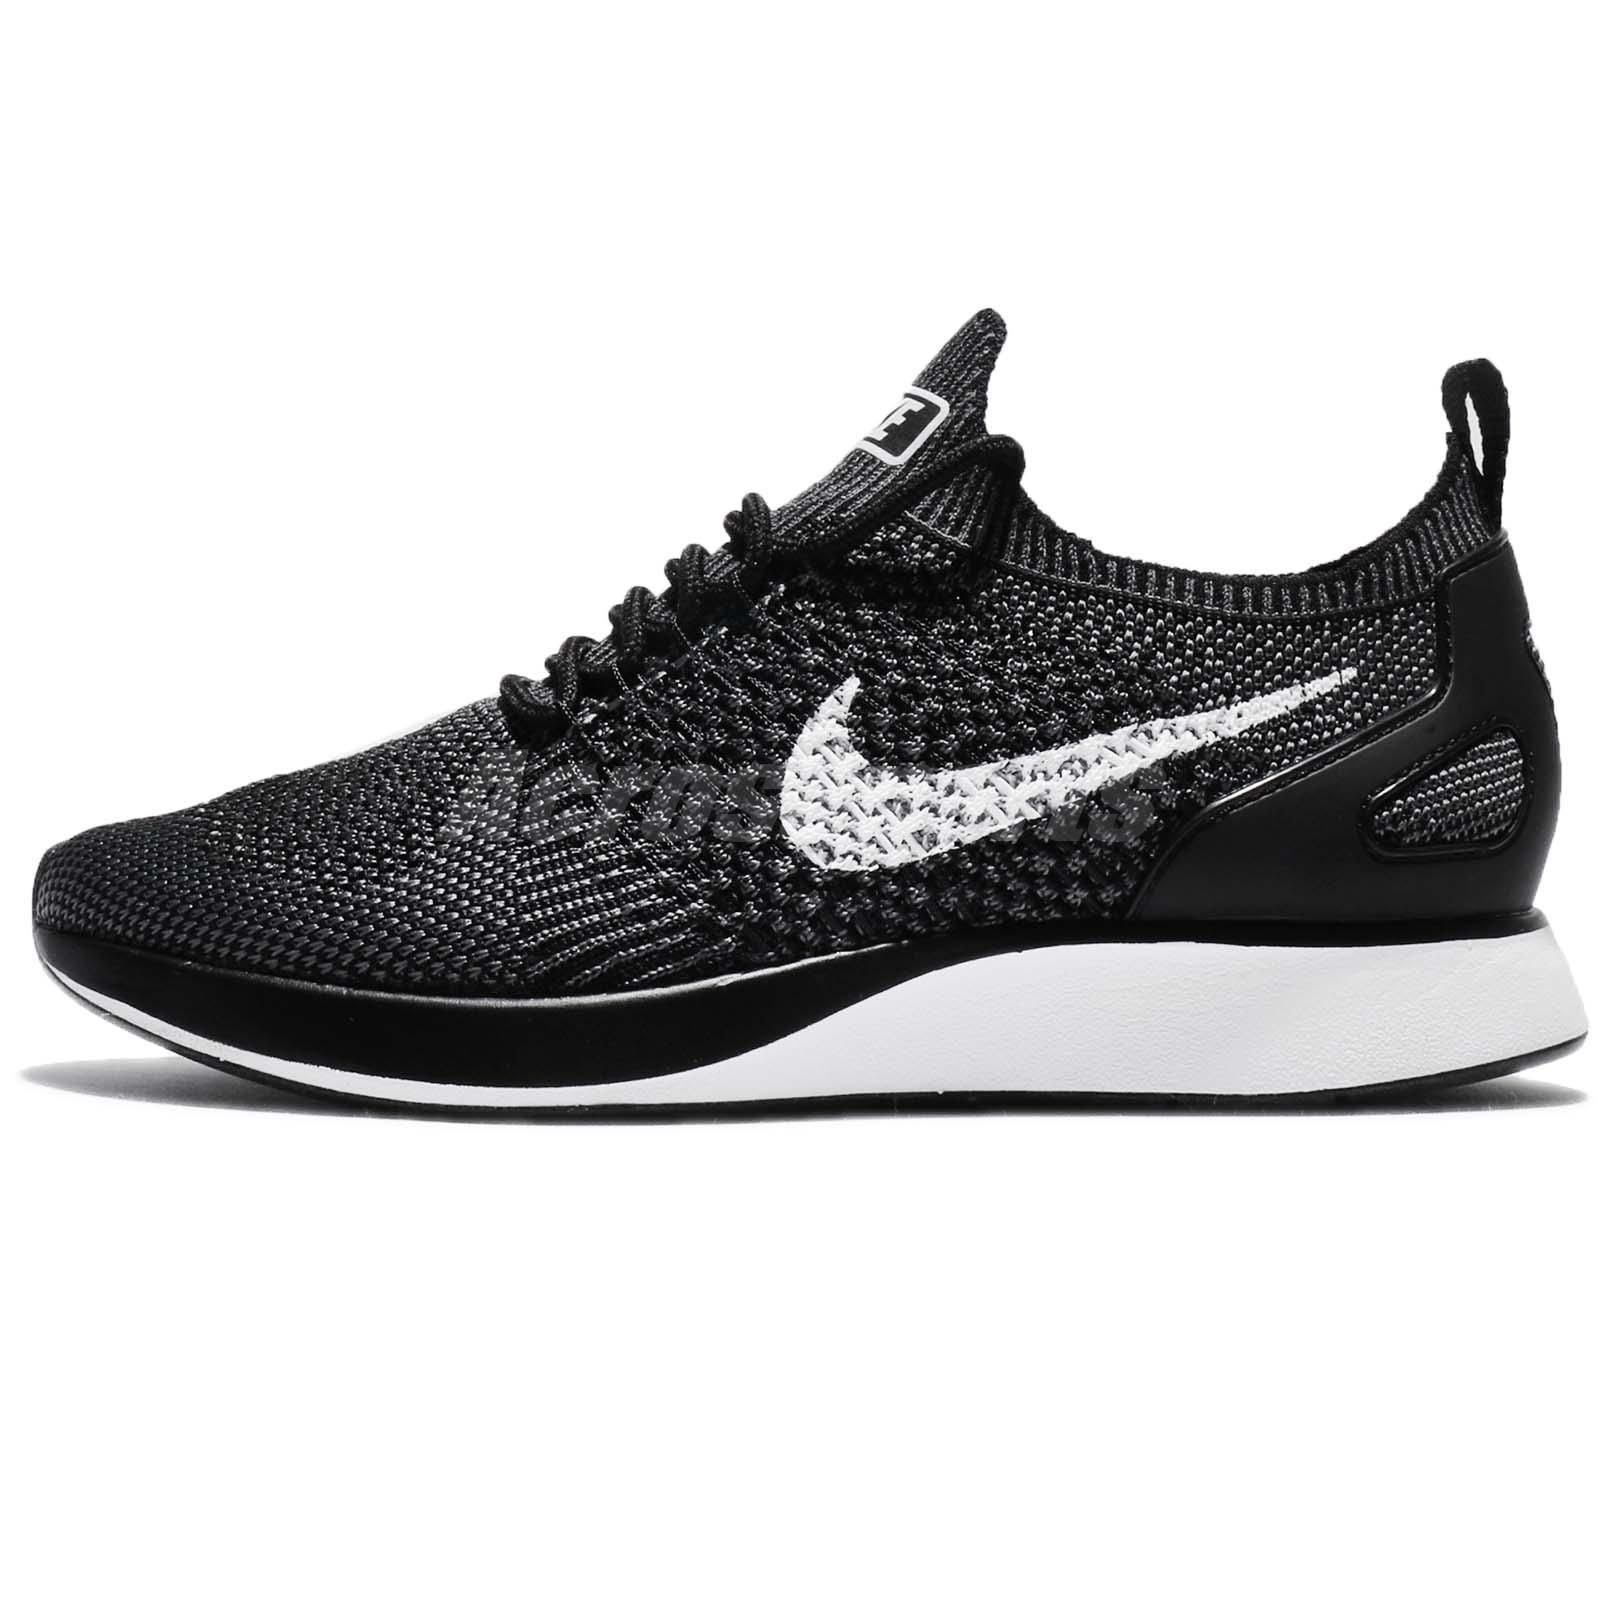 45cb805f49929 Nike Air Zoom Mariah FK Racer PRM Flyknit Womens Running Shoes 917658-002